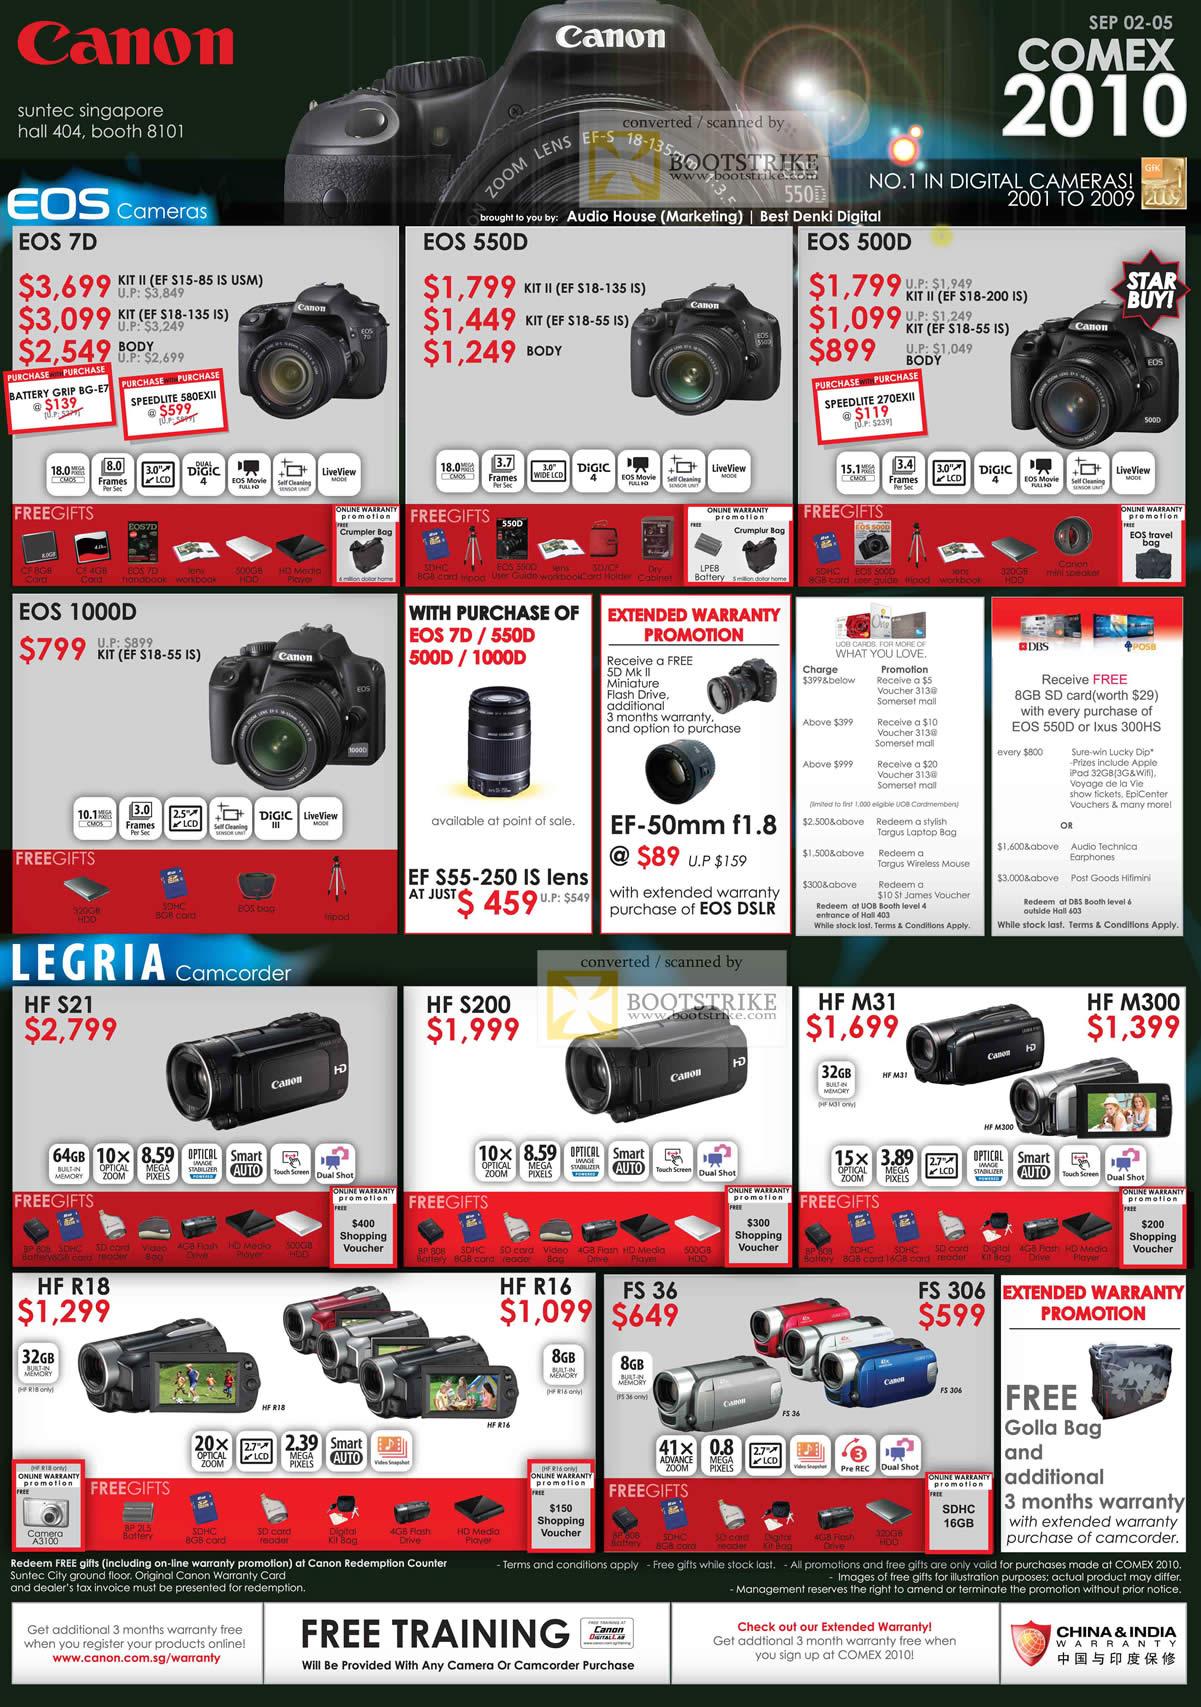 Camera Canon 1000d Dslr Camera Price canon dslr digital cameras eos 7d 550d 500d 1000d legria camcorder comex 2010 price list image brochure of 1000d